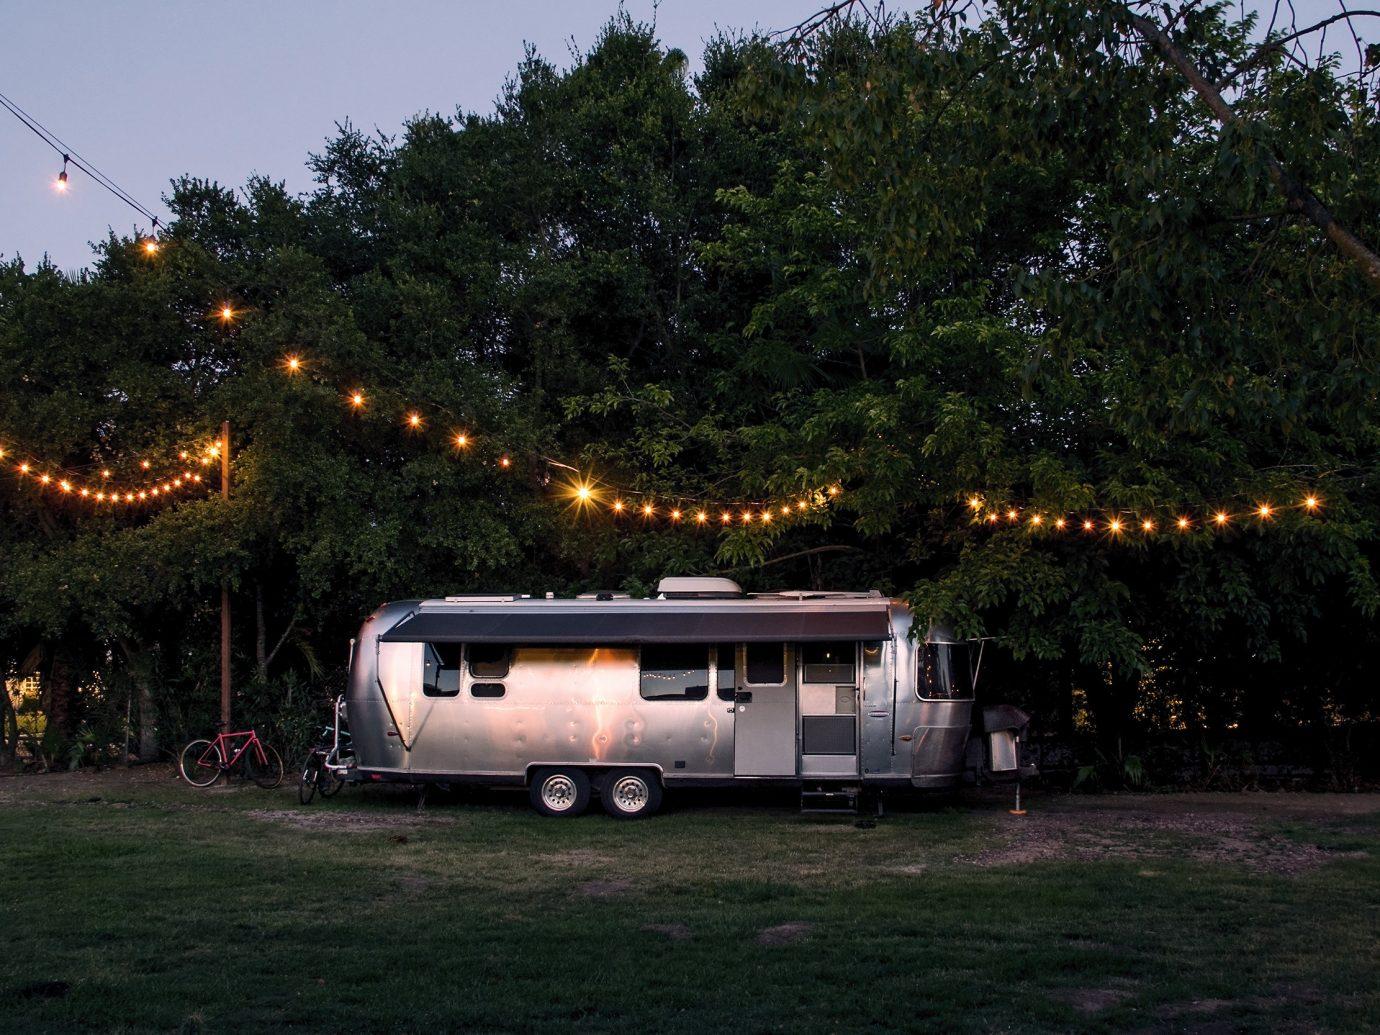 Trip Ideas tree outdoor grass sky night light atmosphere of earth vehicle lighting transport evening